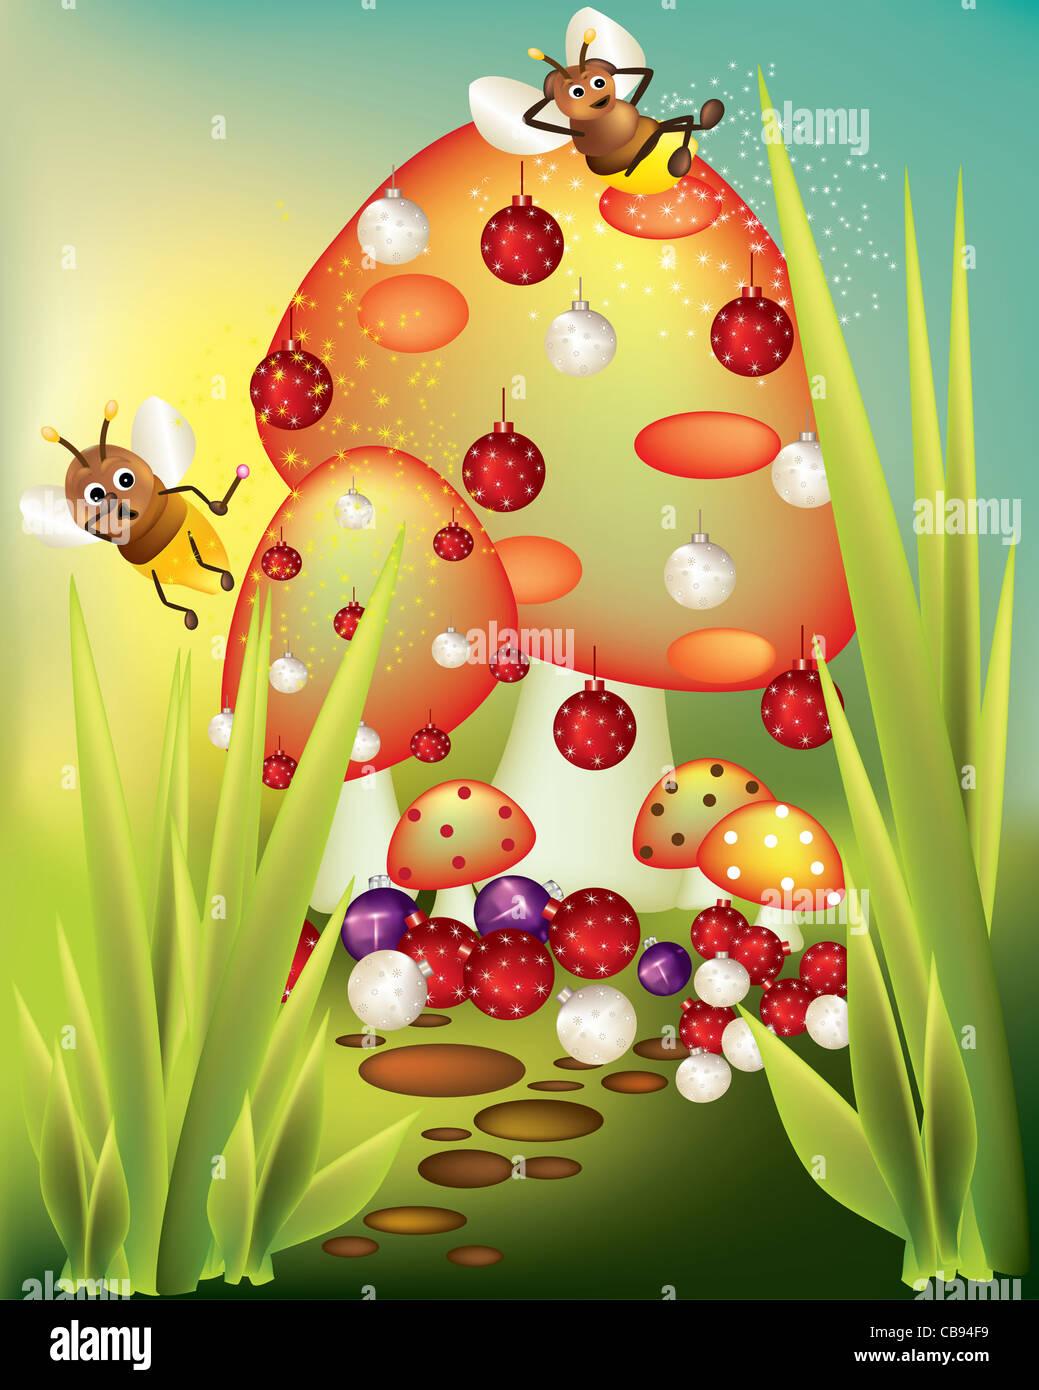 Christmas in wonderland - Stock Image